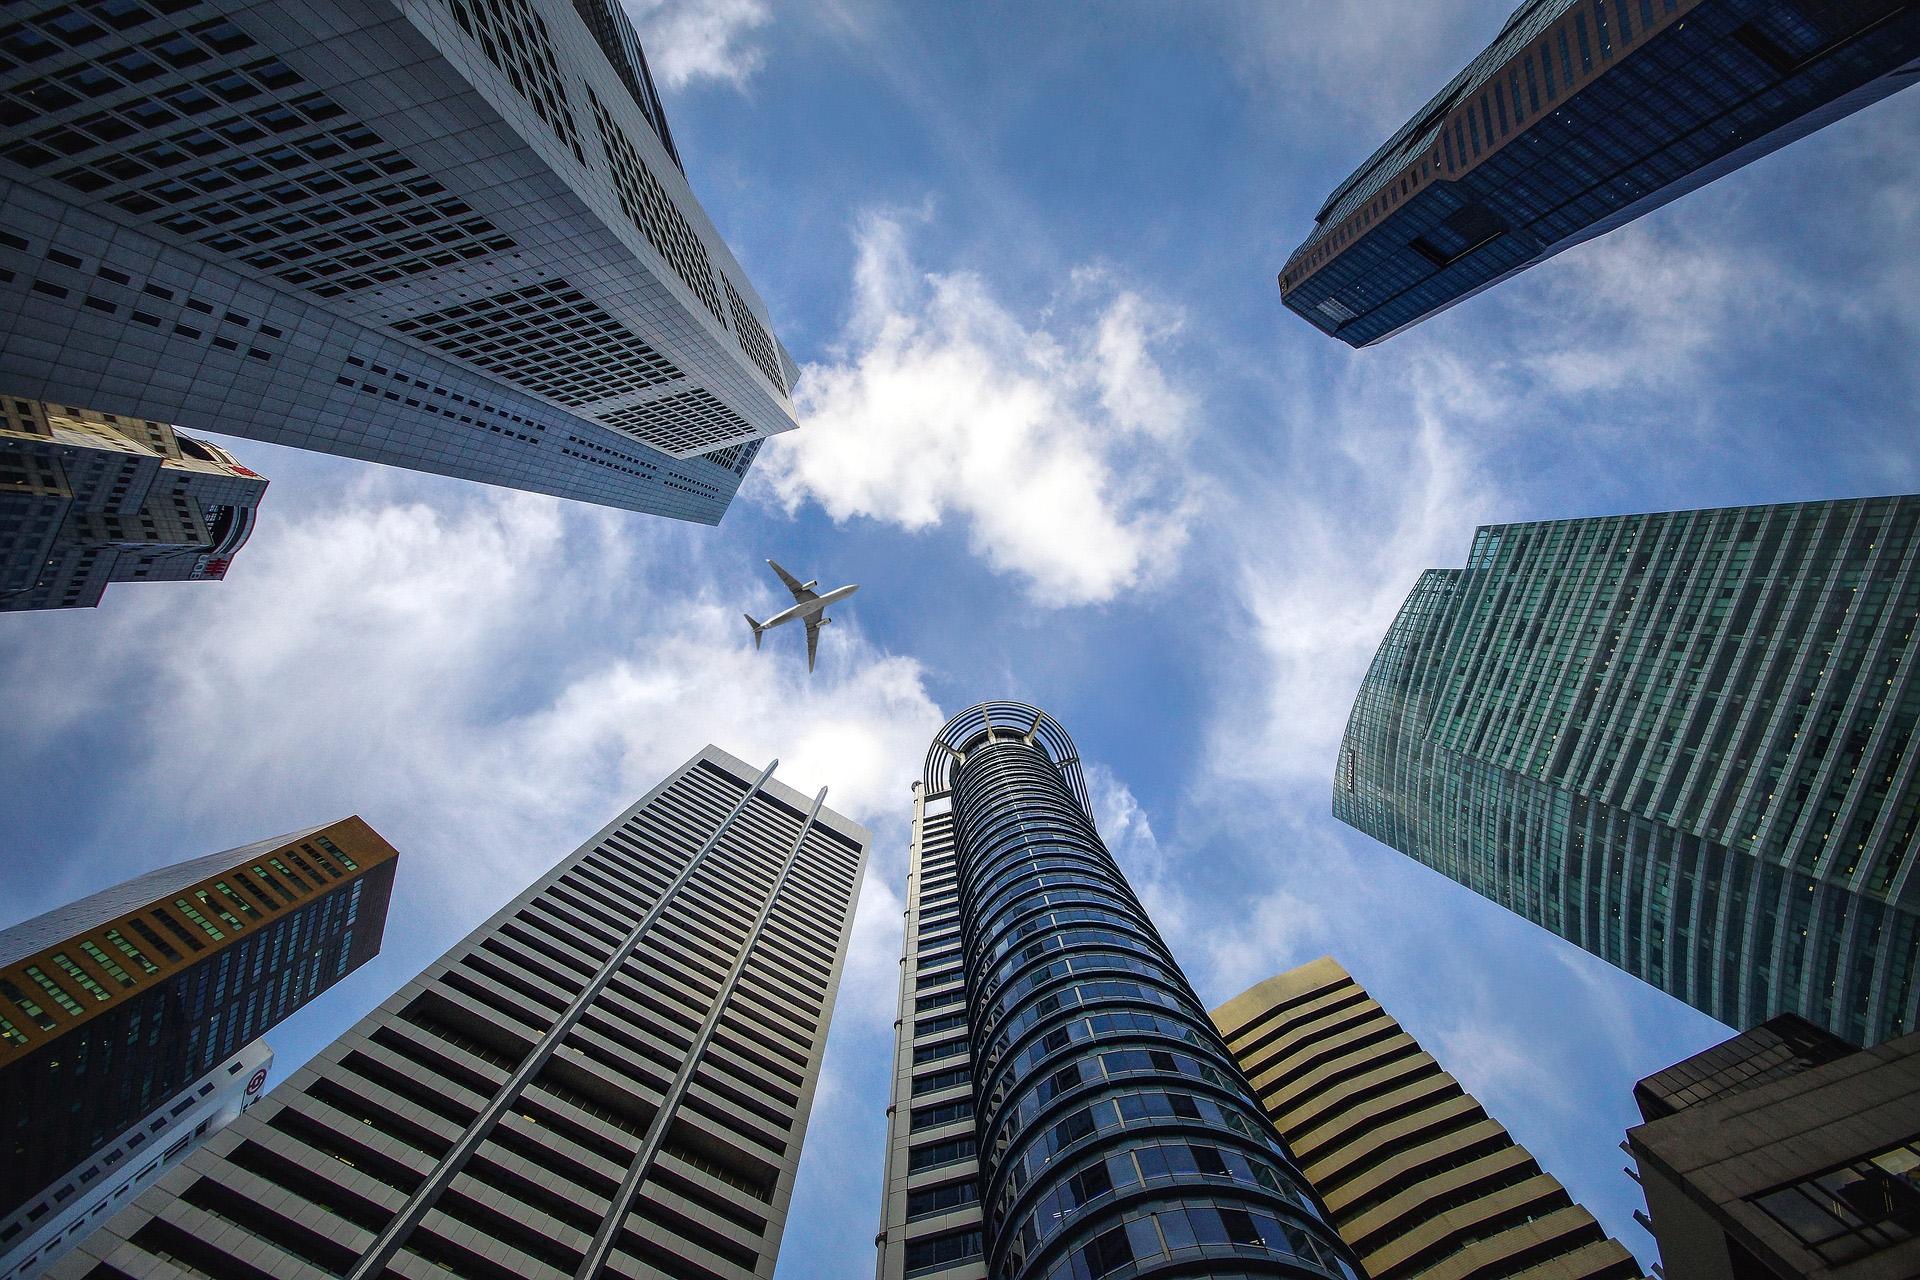 https://www.a-bex.com/wp/wp-content/uploads/2021/07/skyscraper-3184798_1920.jpg